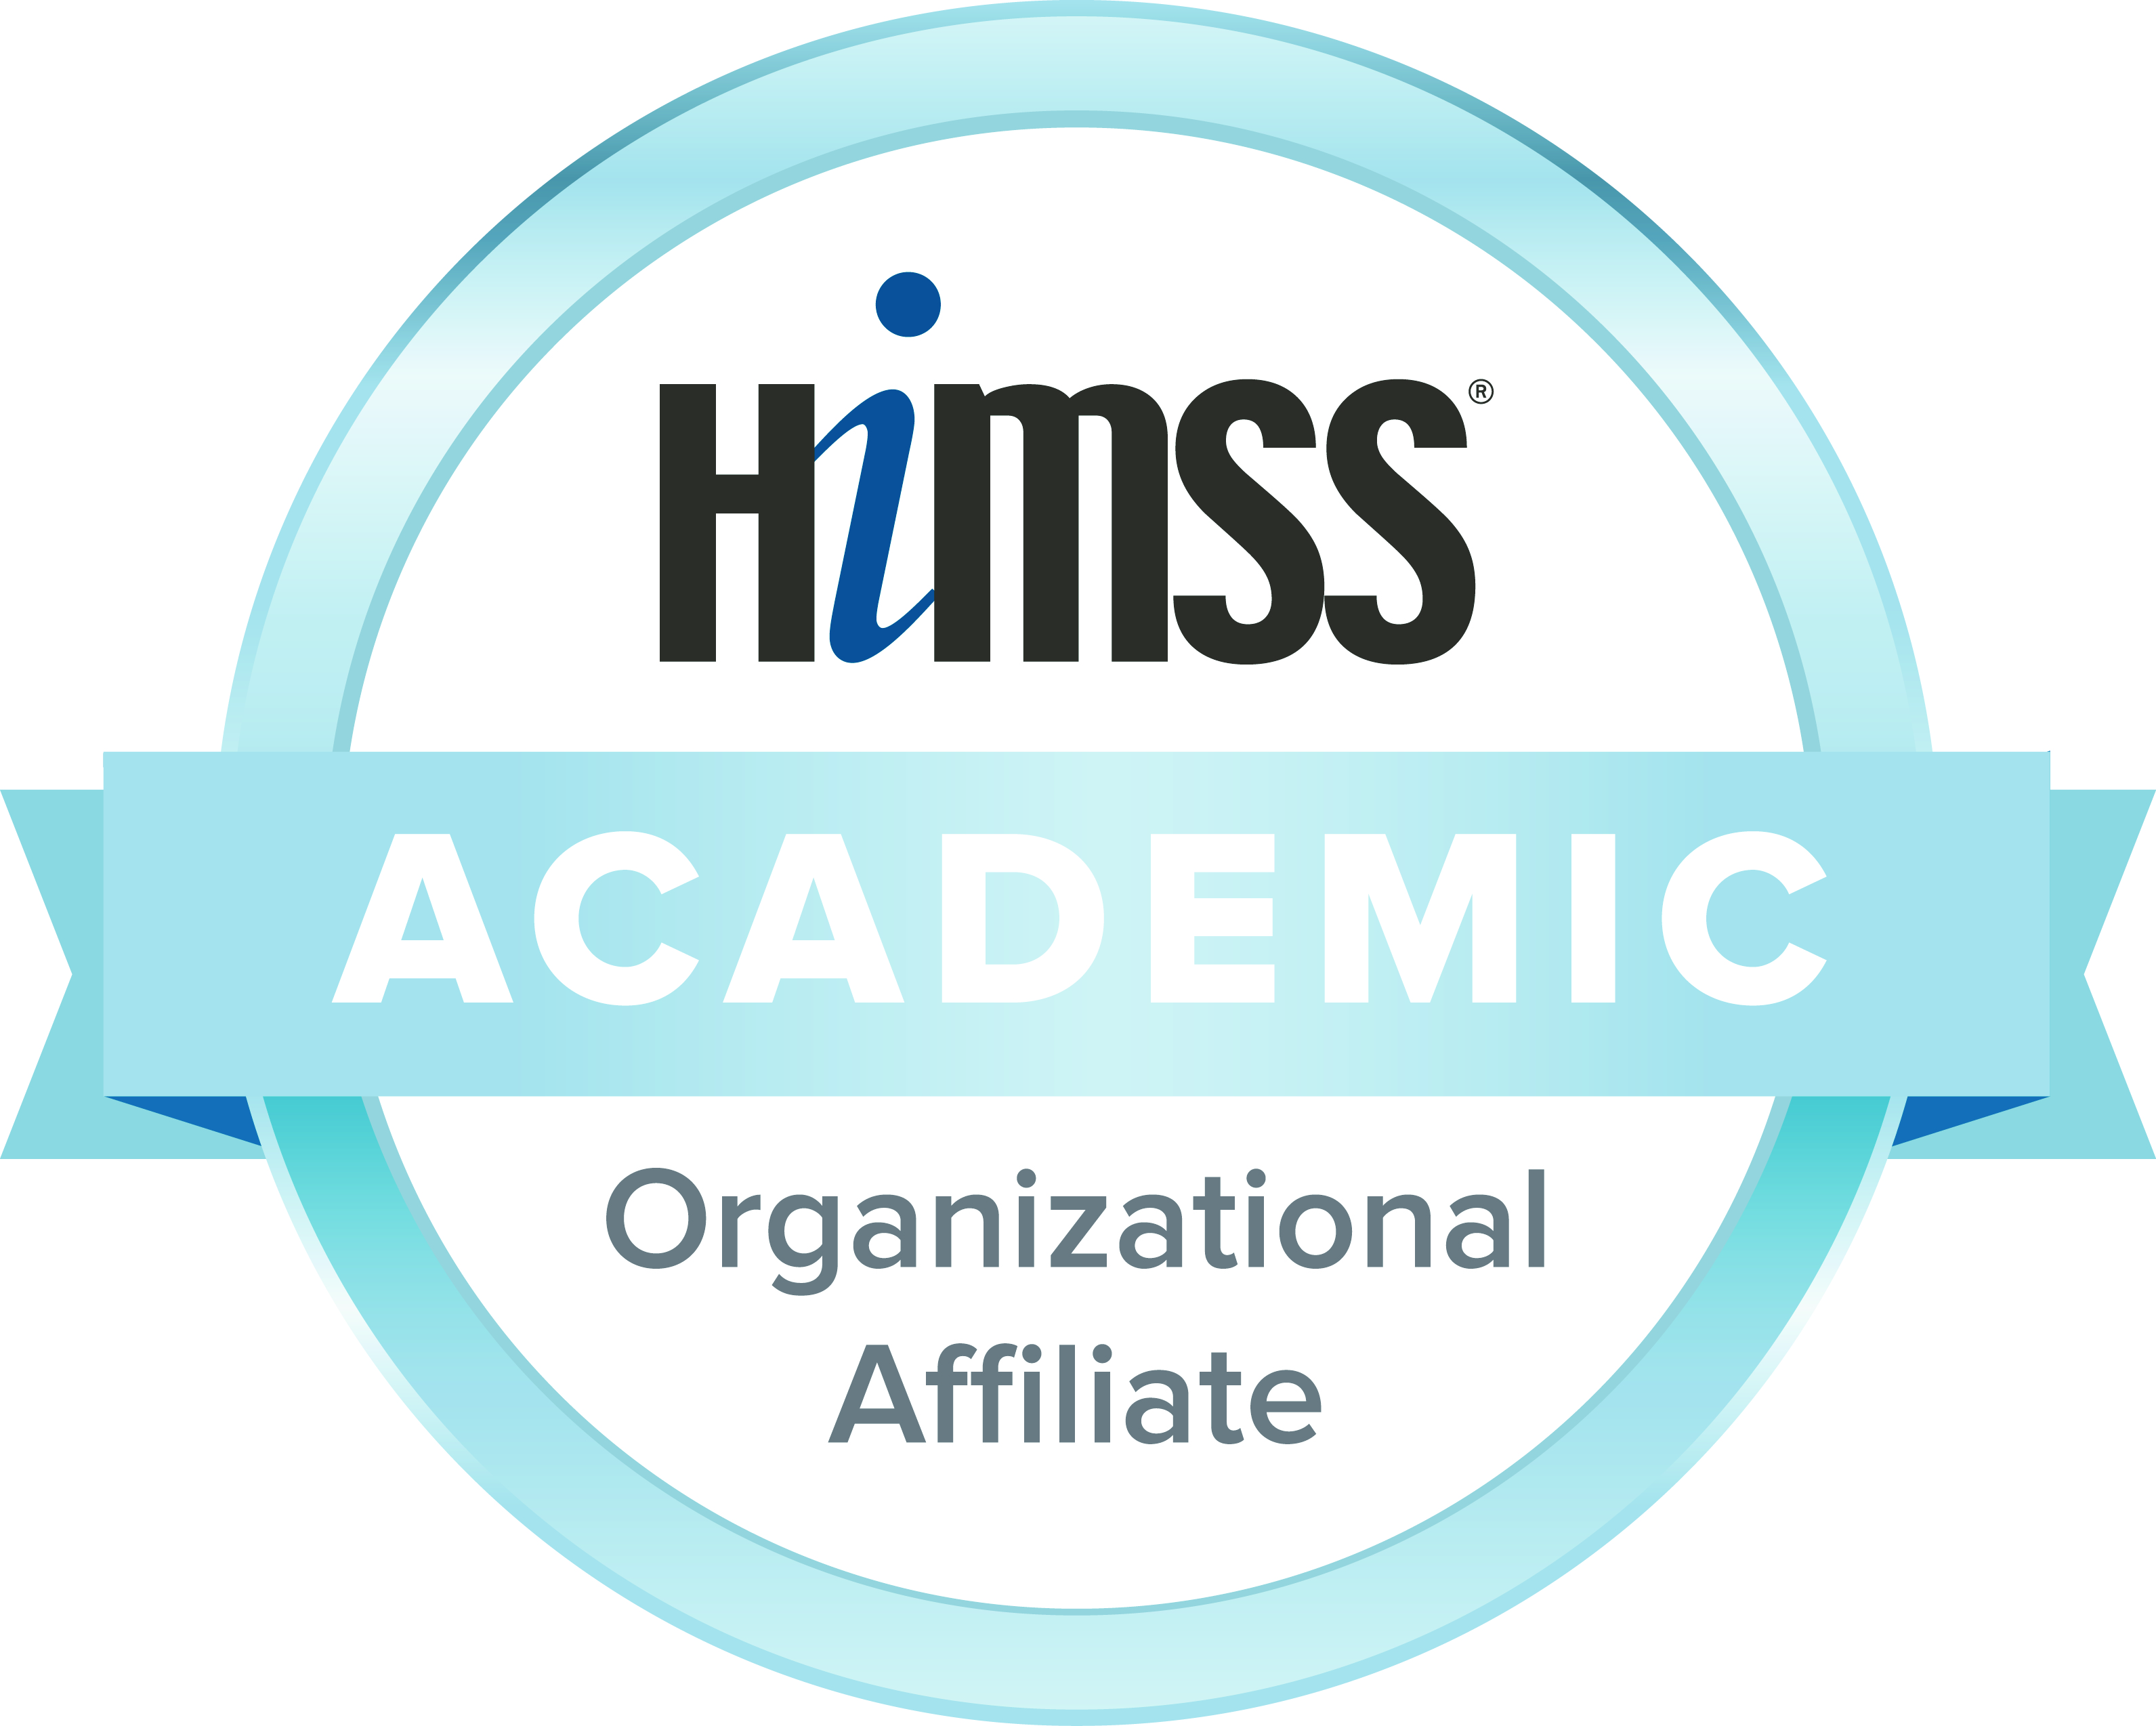 HIMSS_OACM_Seal_ACADEMIC